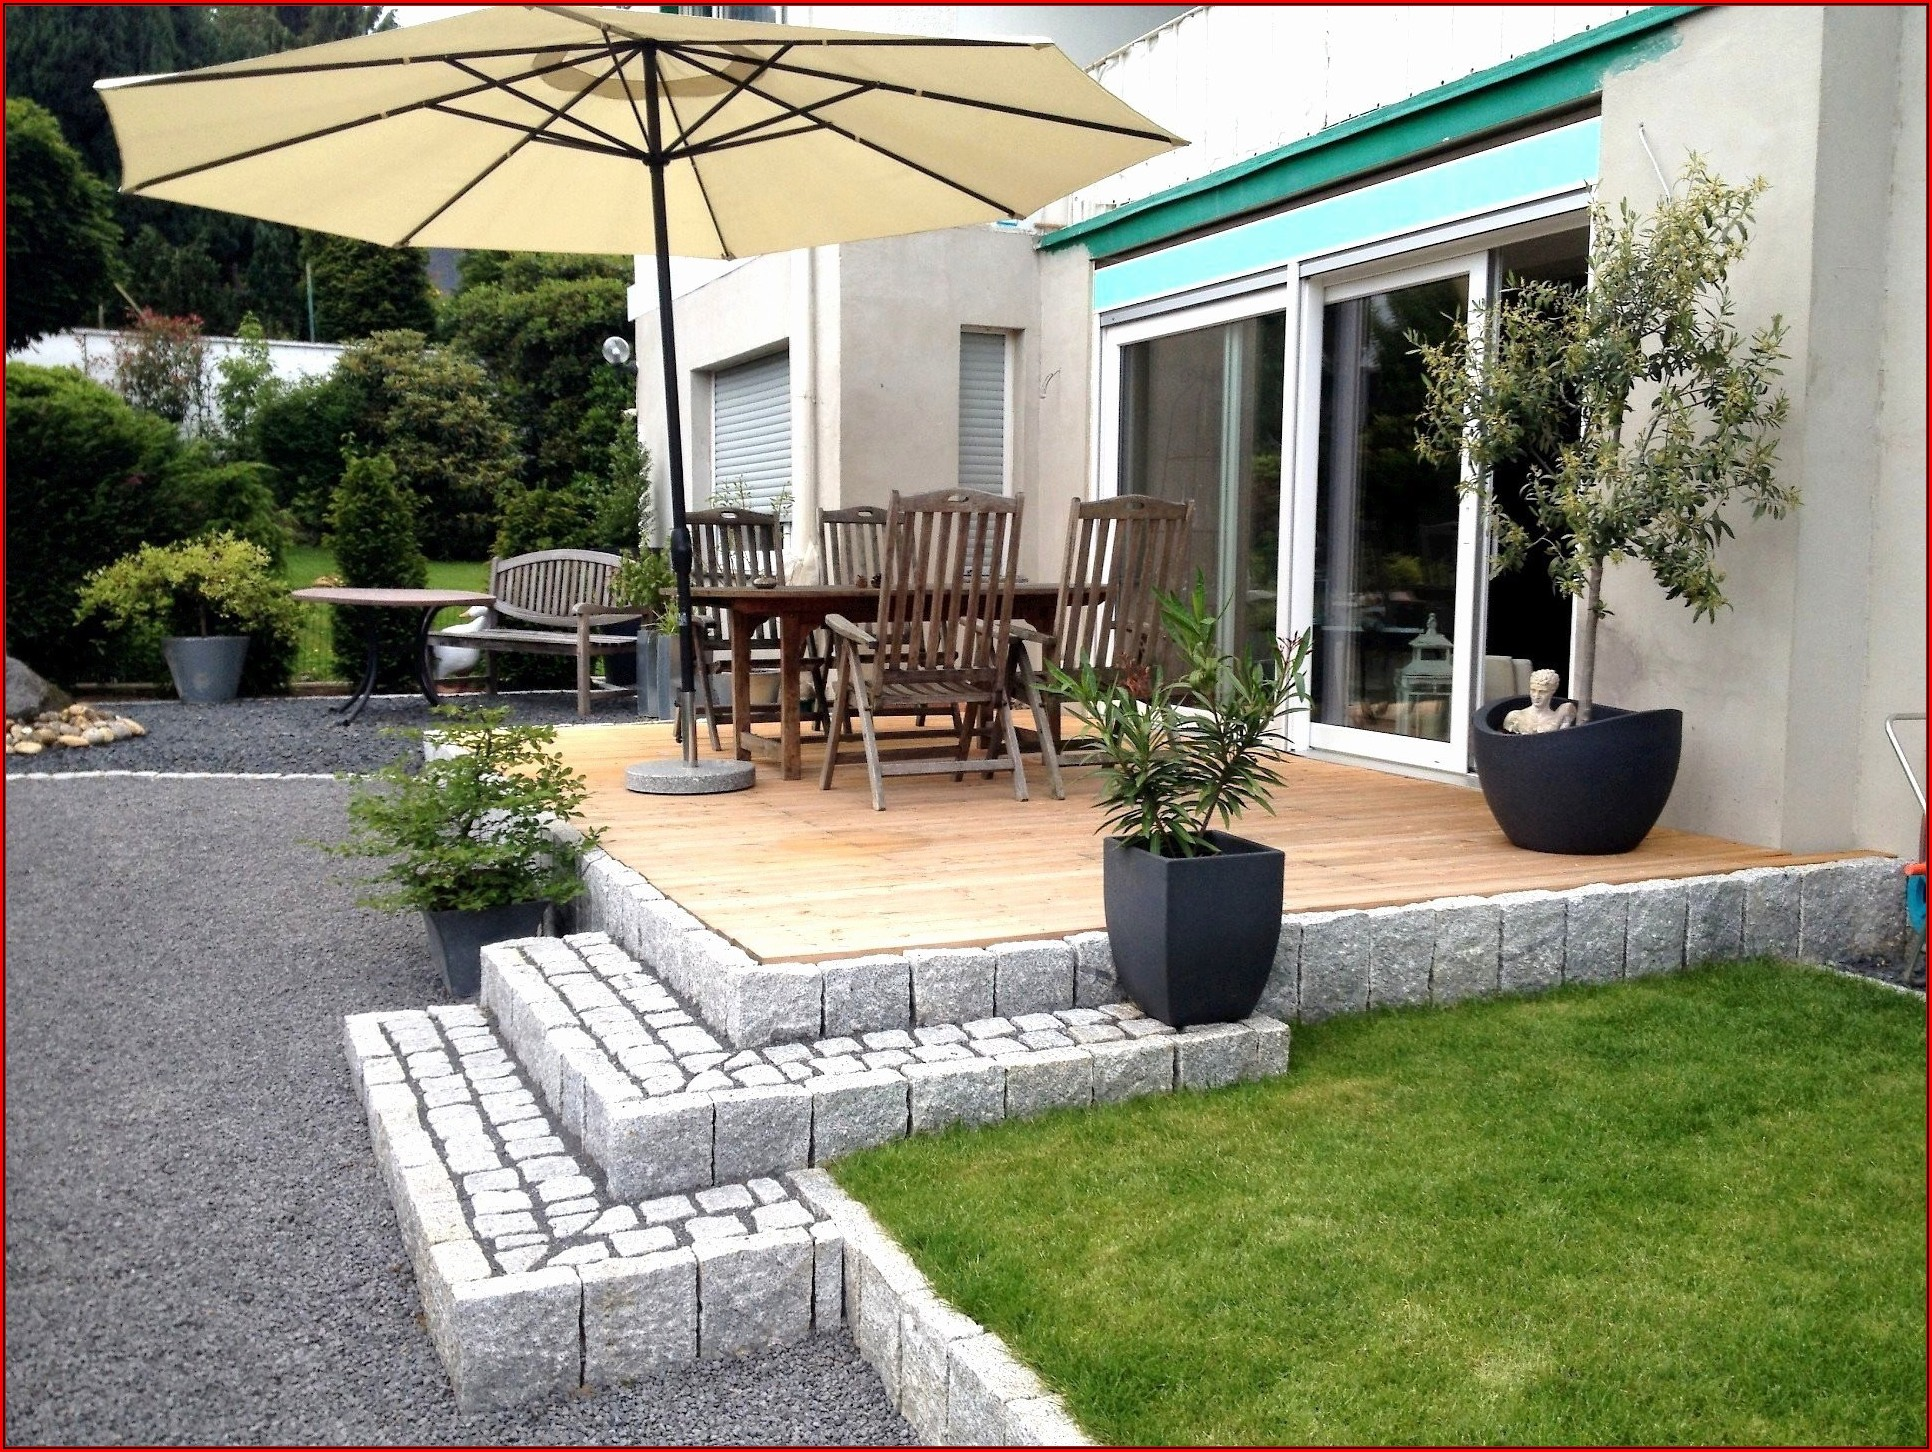 Terrasse Renovieren Ideen